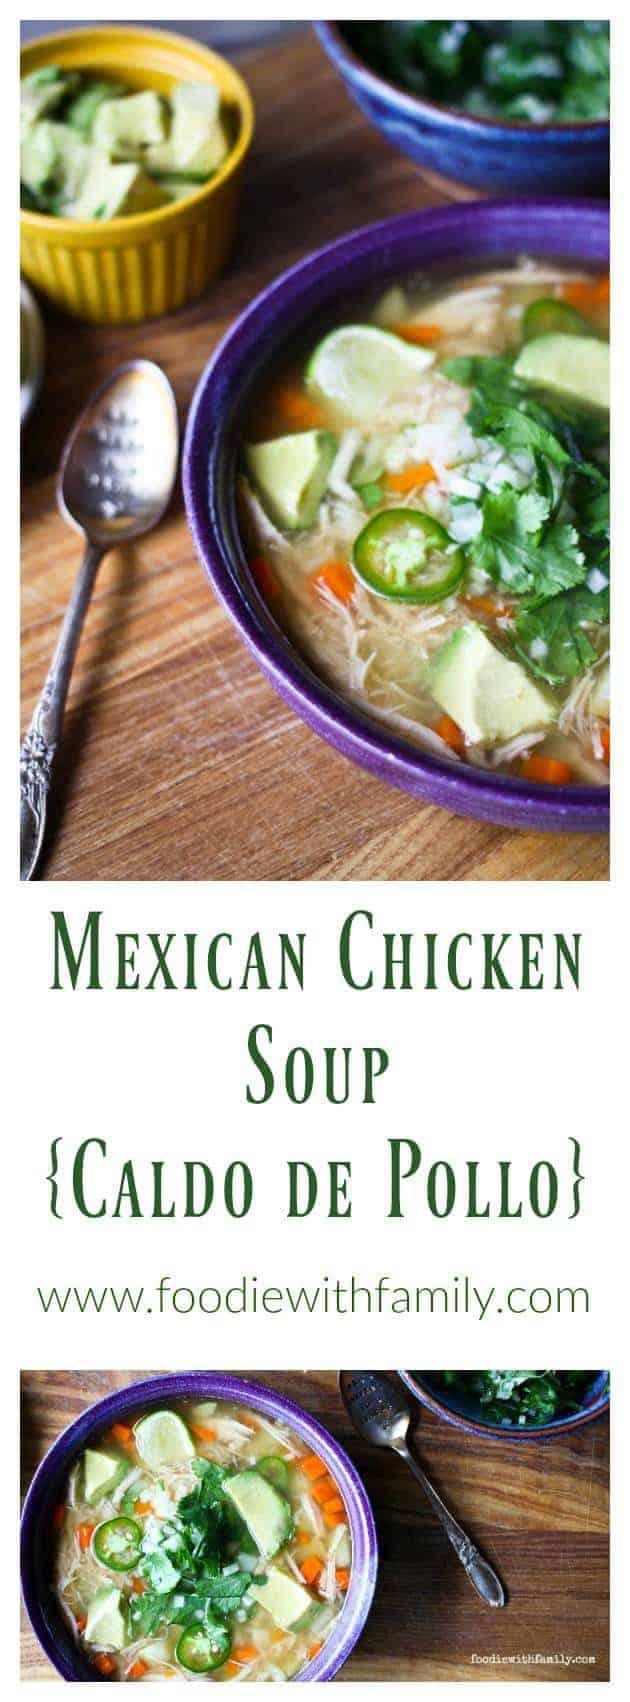 Mexican Chicken Soup Caldo de Pollo from foodiewithfamily.com